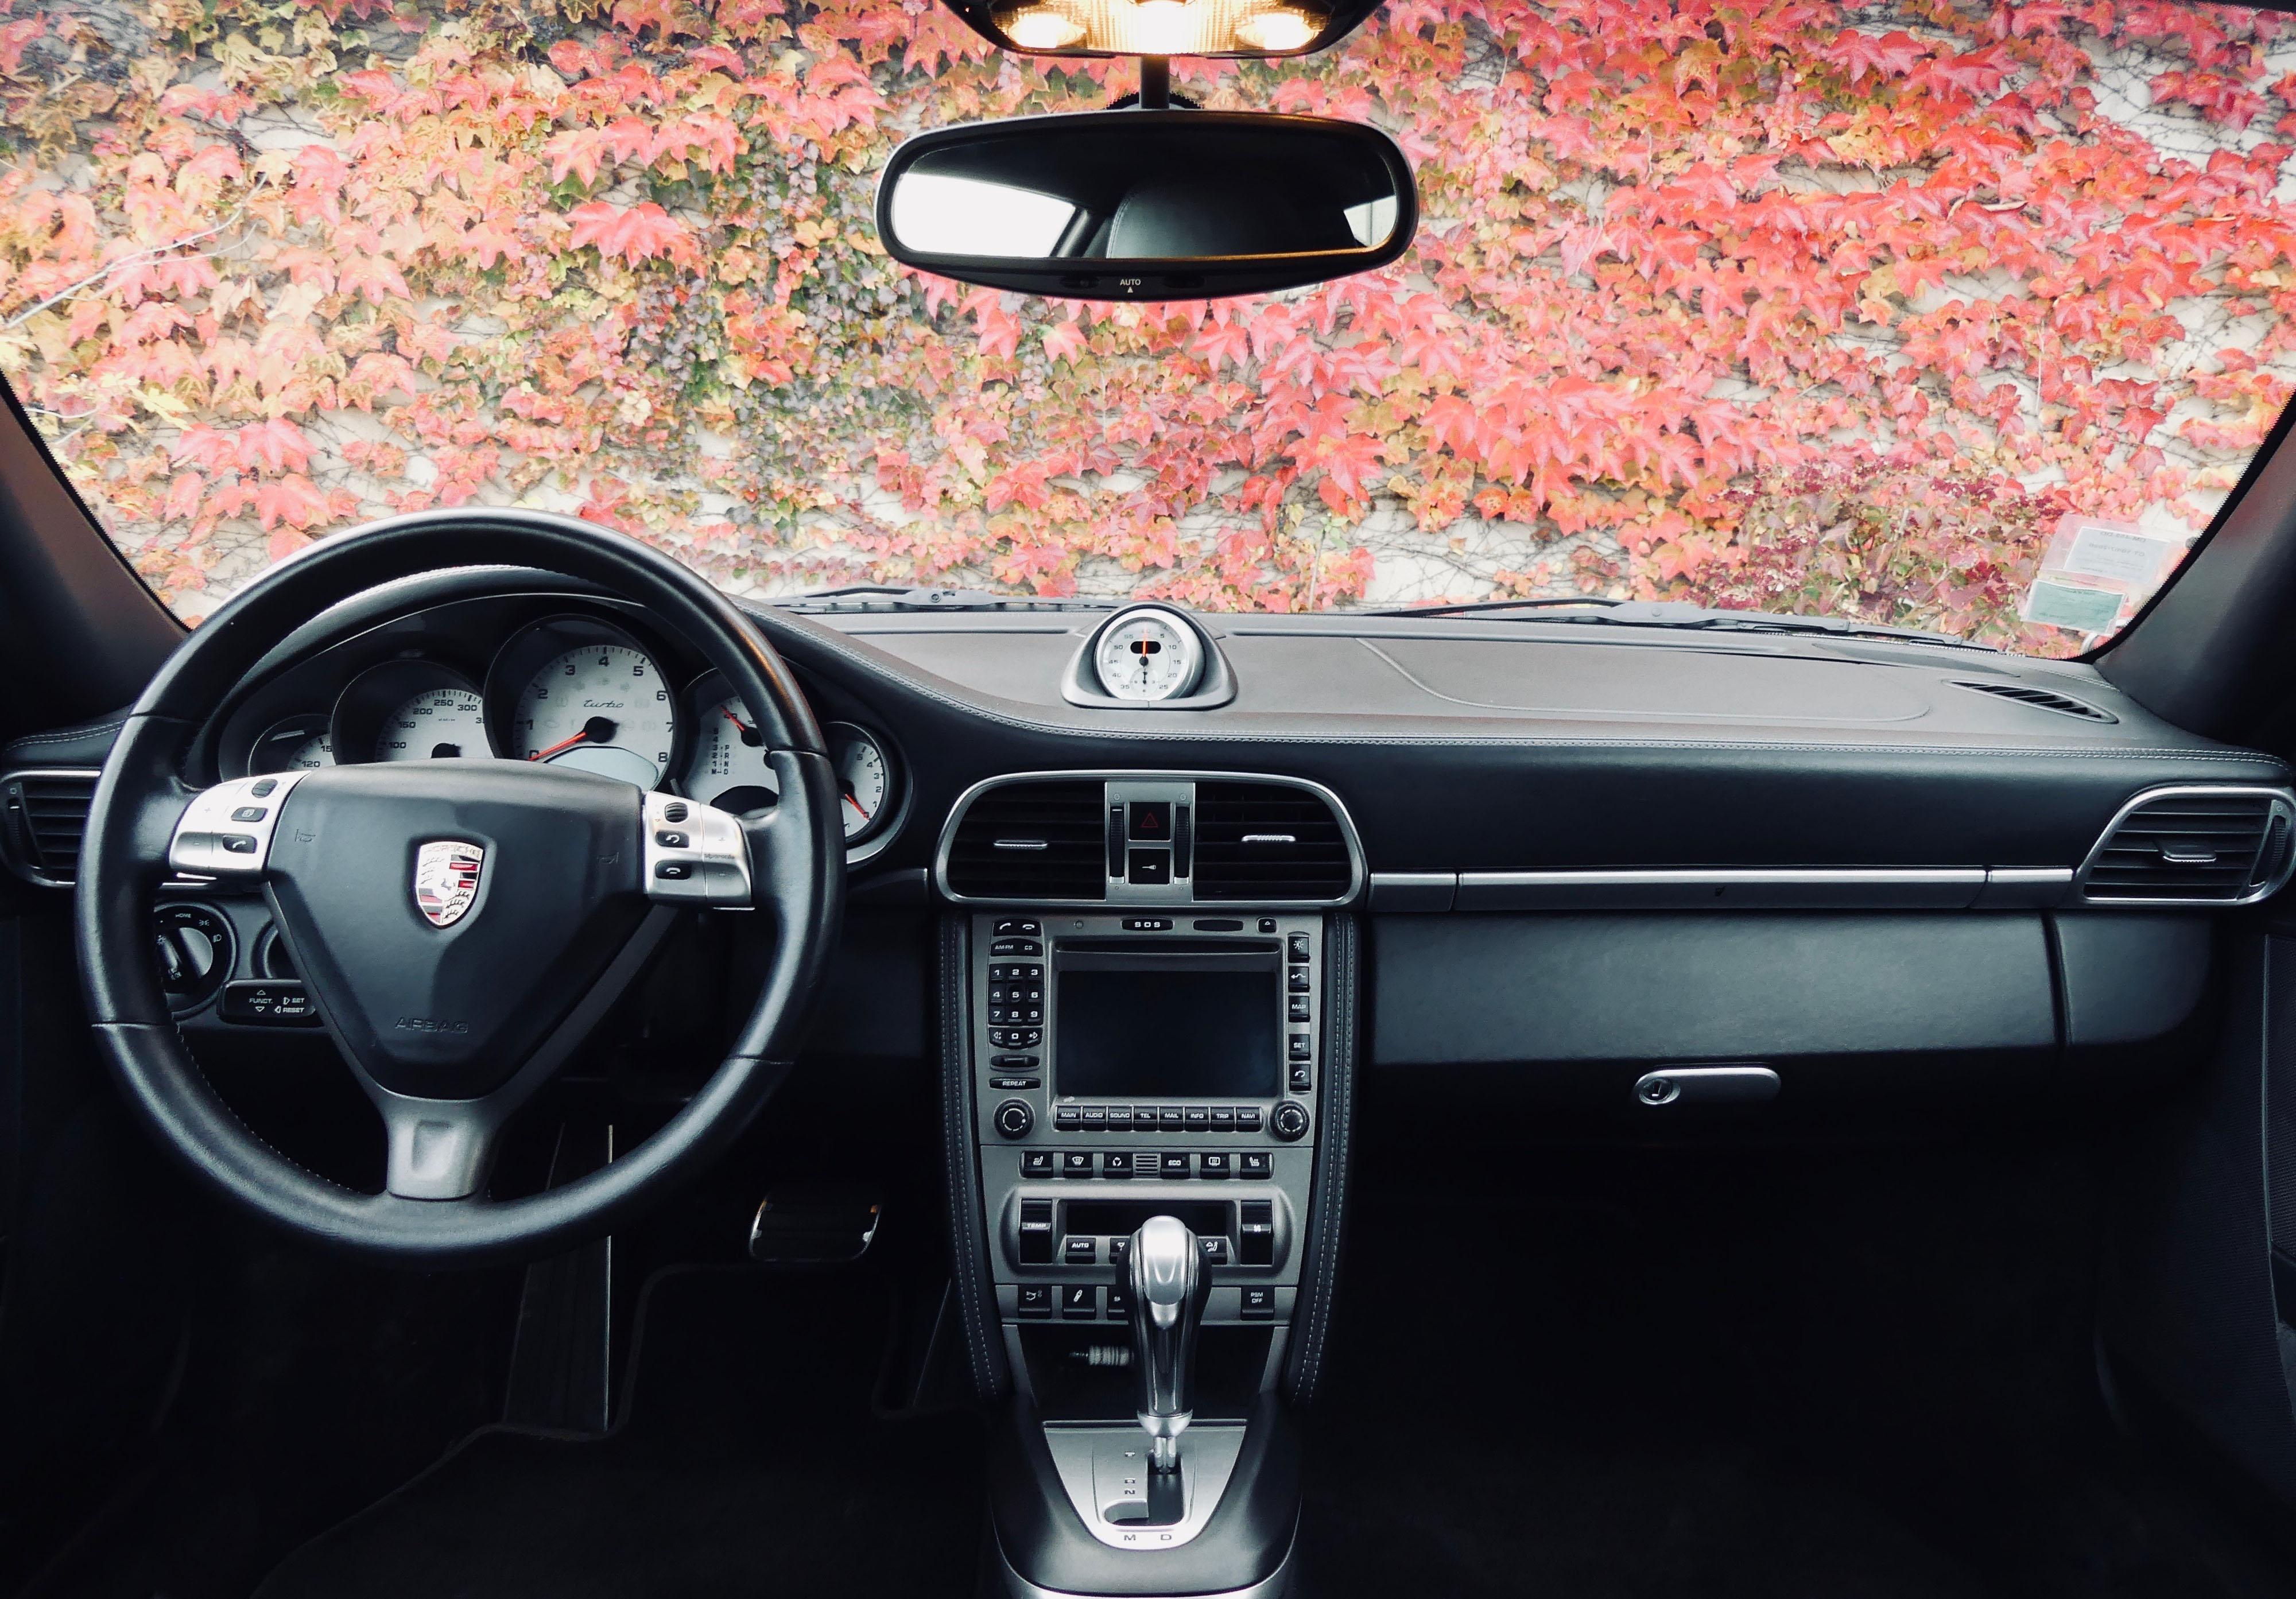 PORSCHE 911 997 Turbo 2